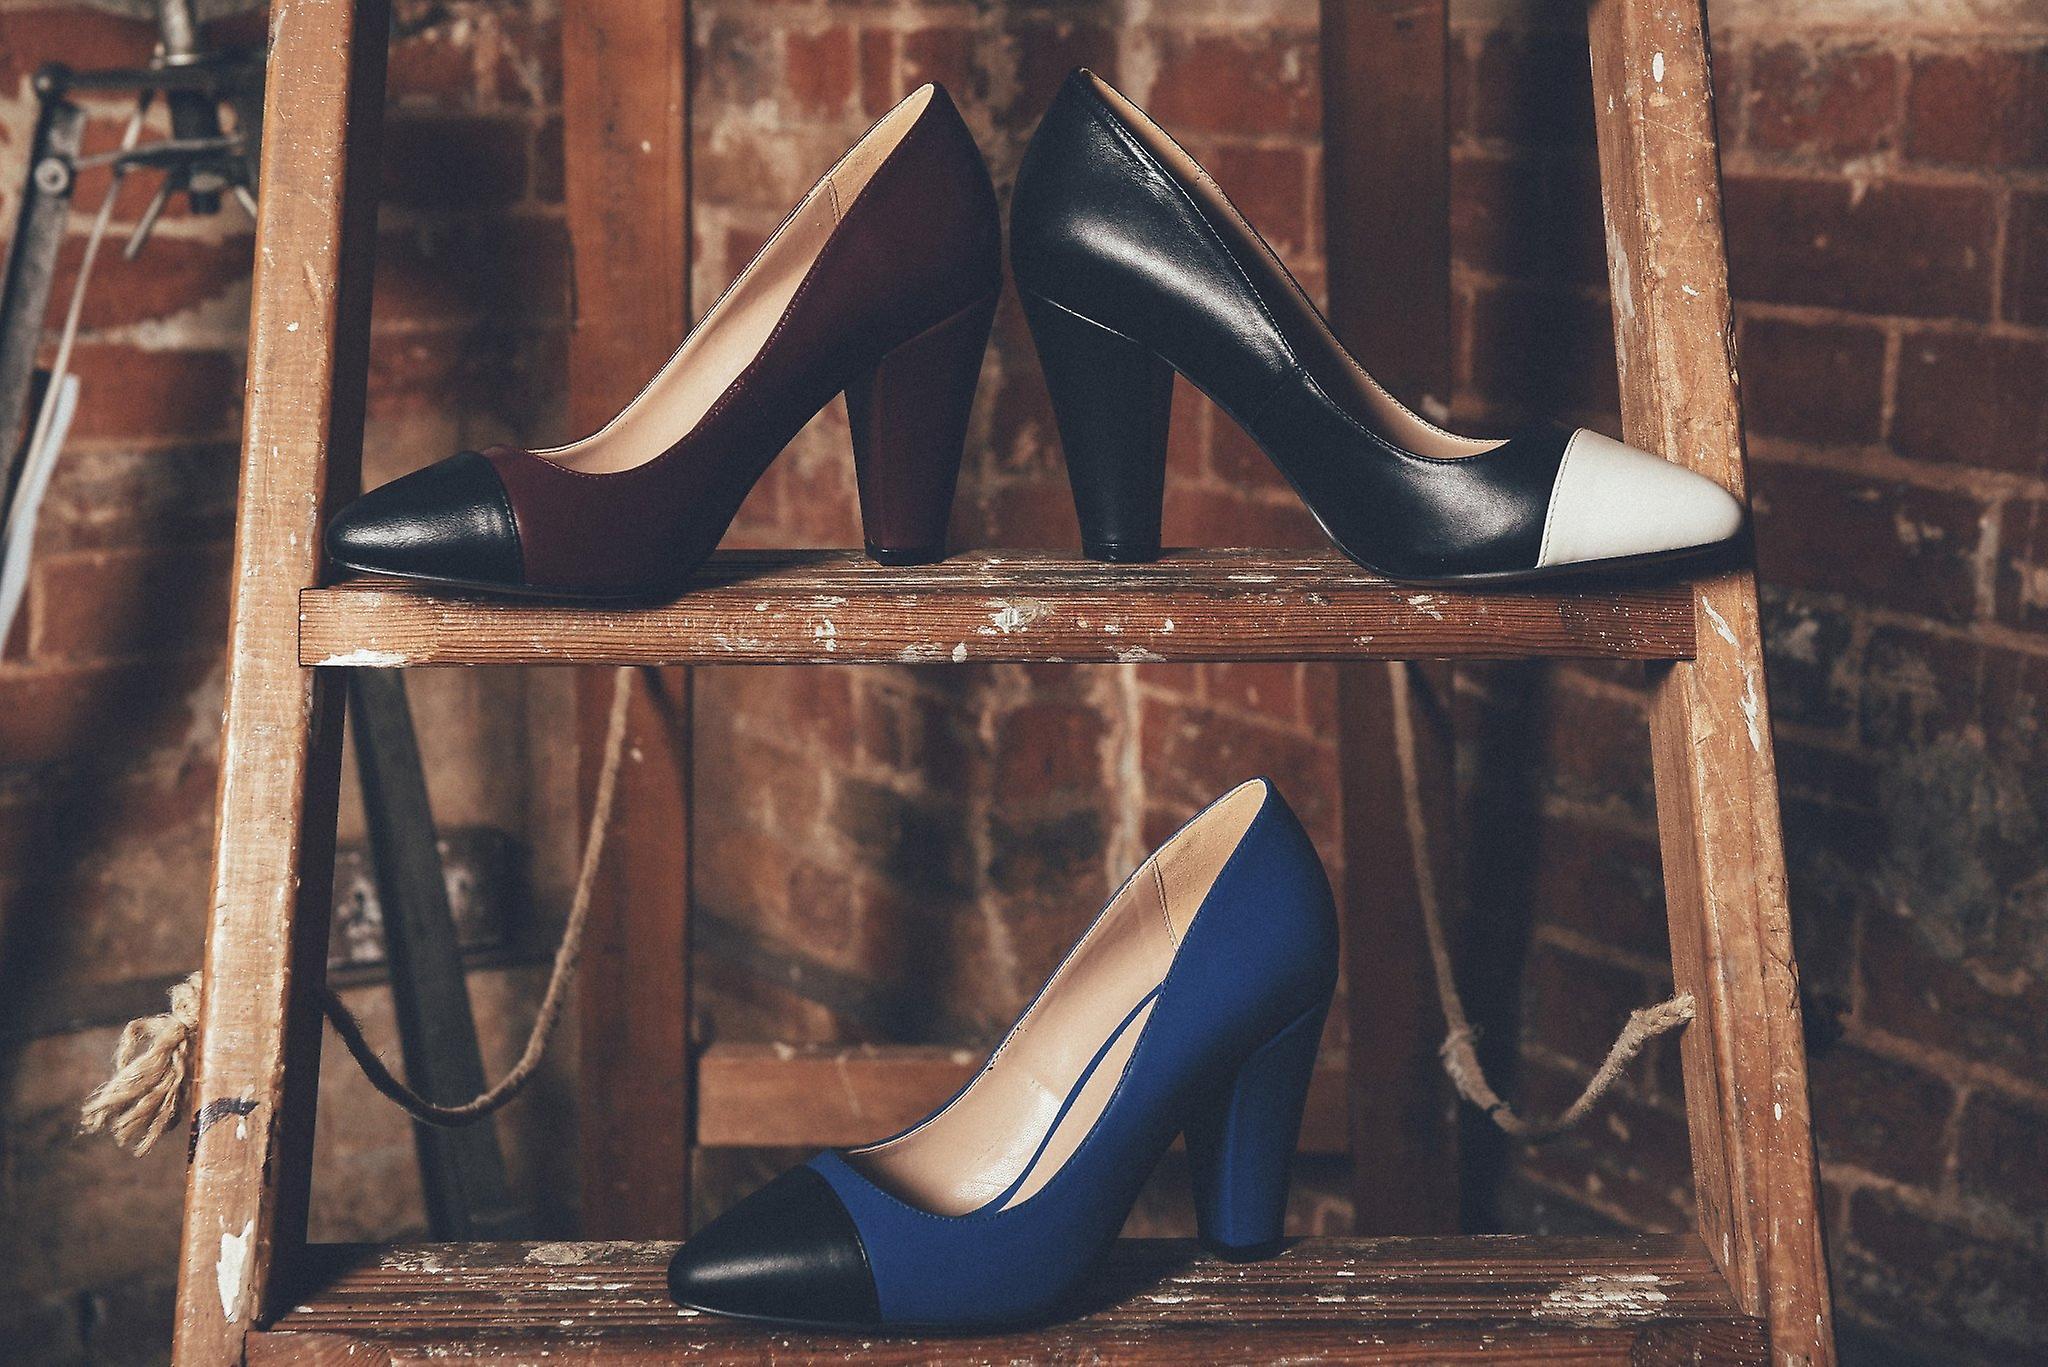 Beaulieu plum shoes